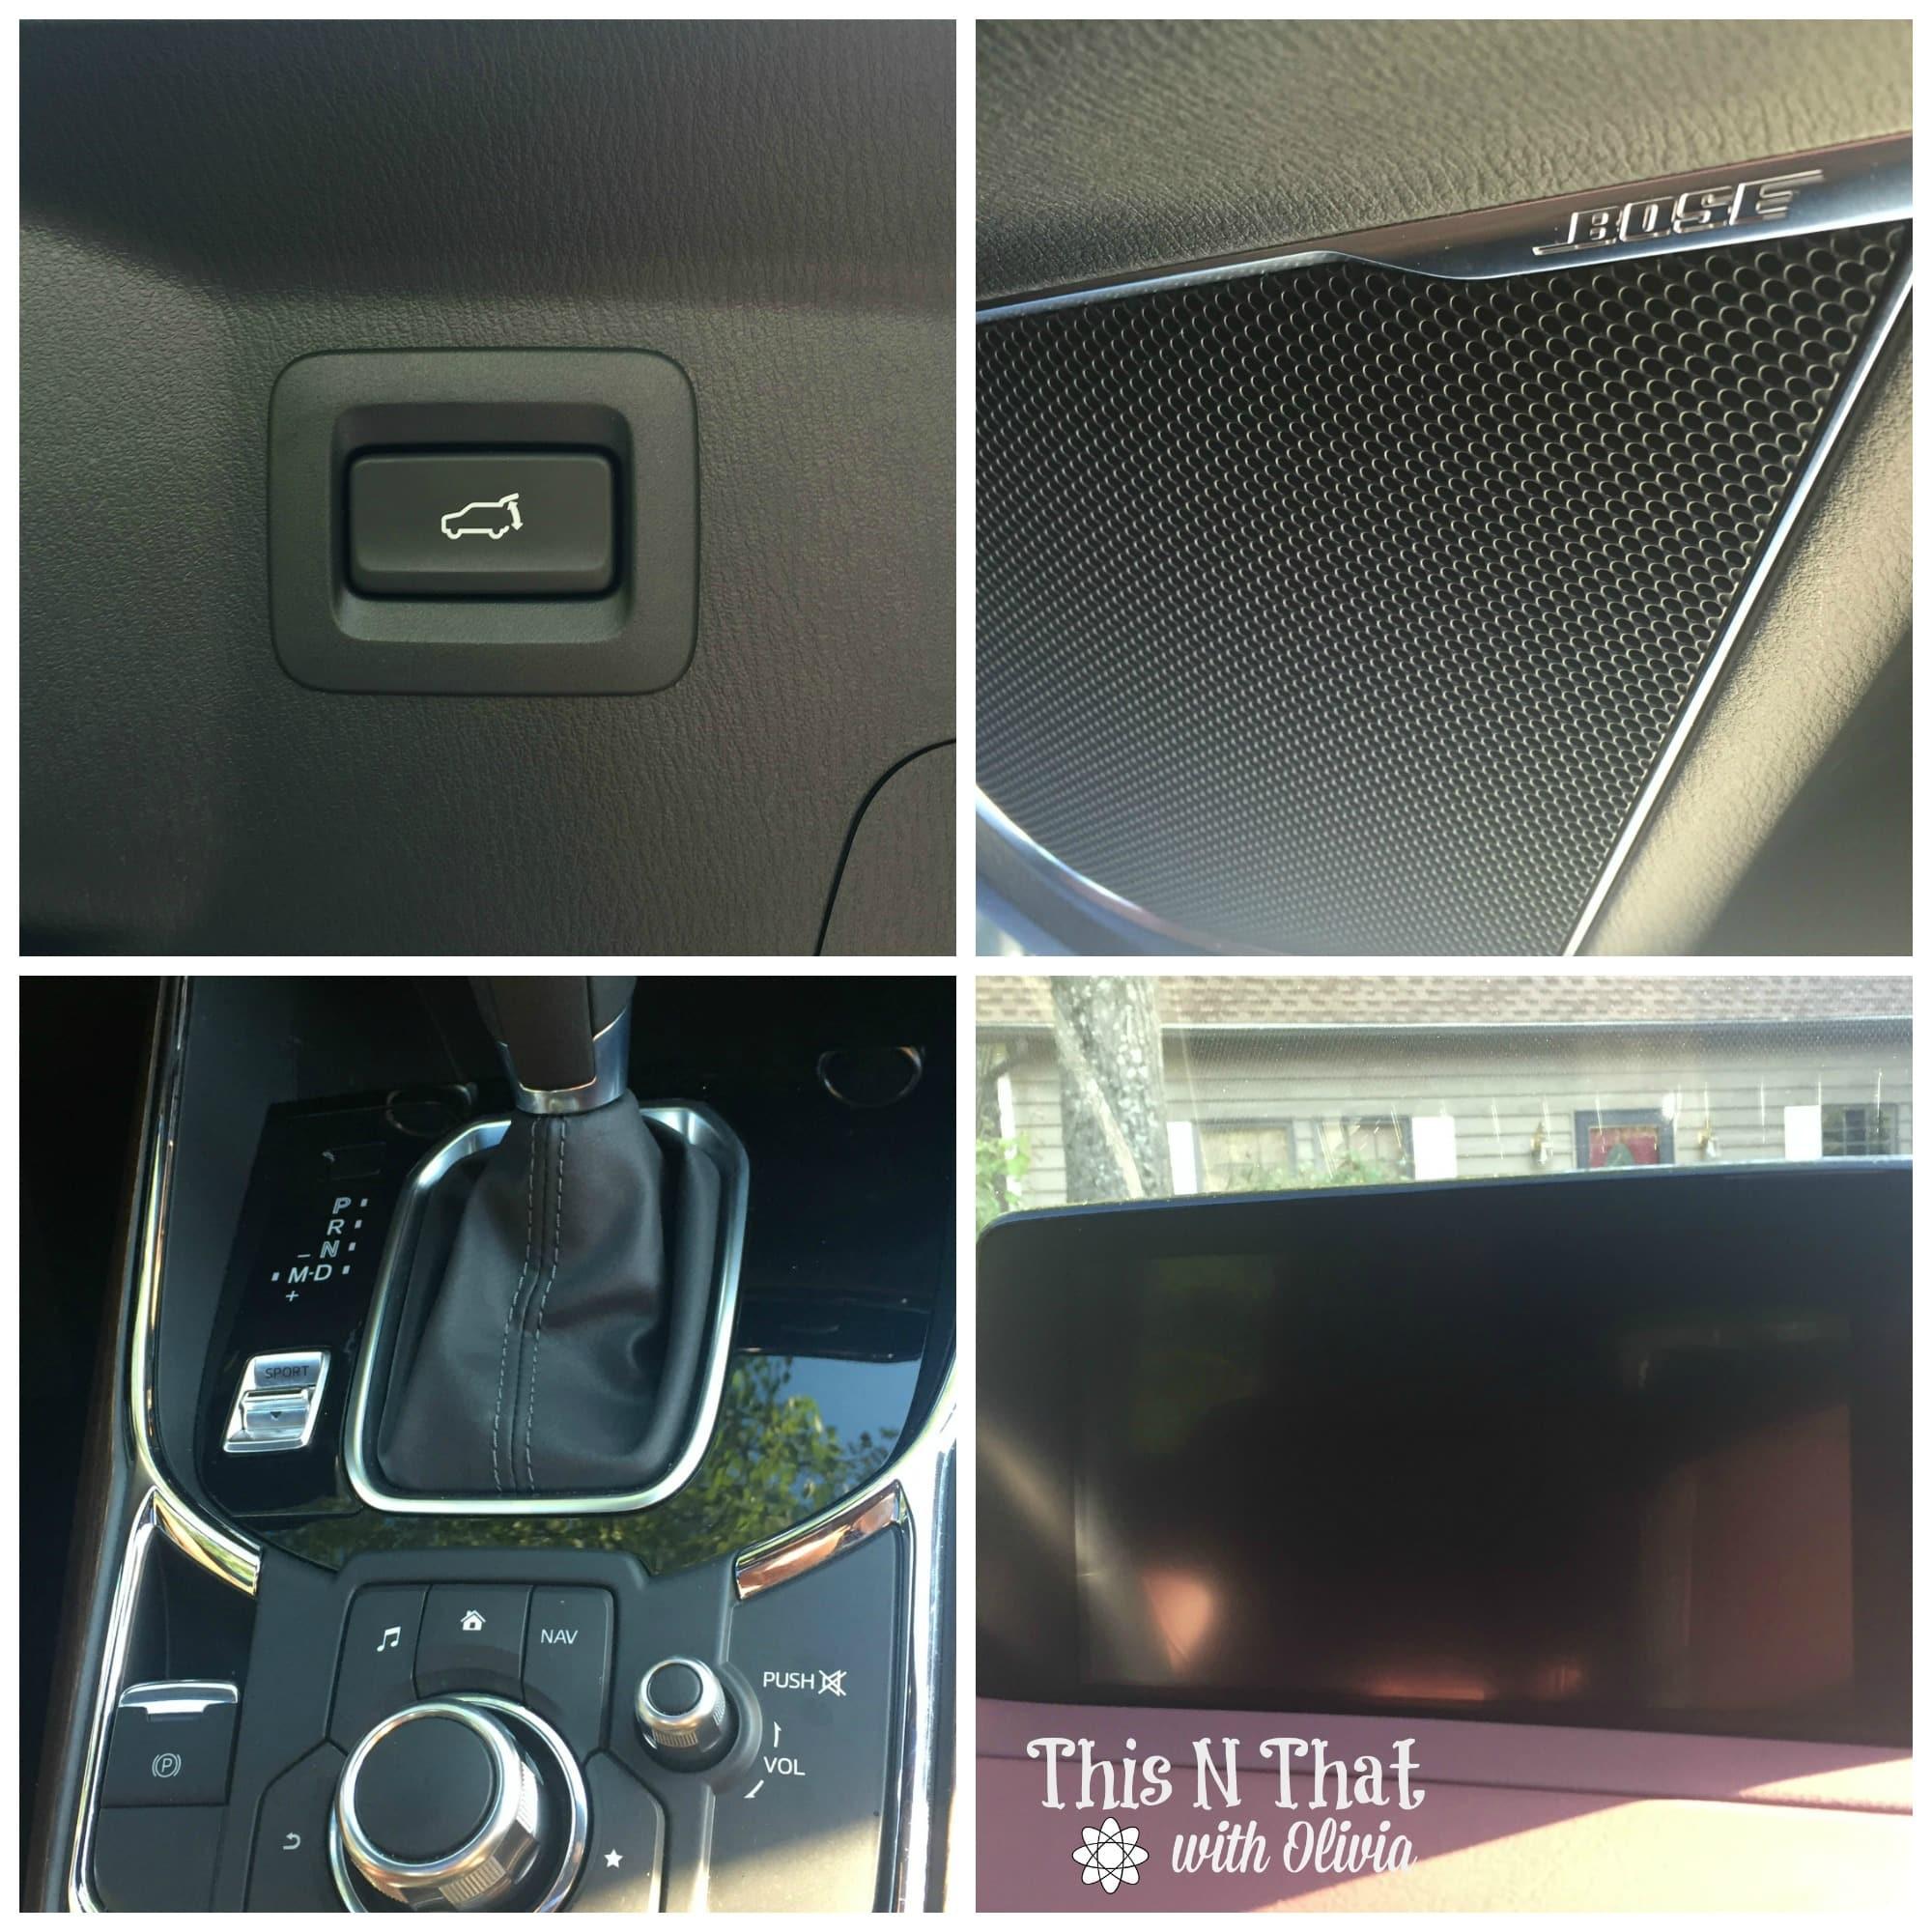 2016 Mazda CX-9 AWD Review #DriveMazda @MazdaUSA #DriveShop #Ad| ThisNThatwithOlivia.com